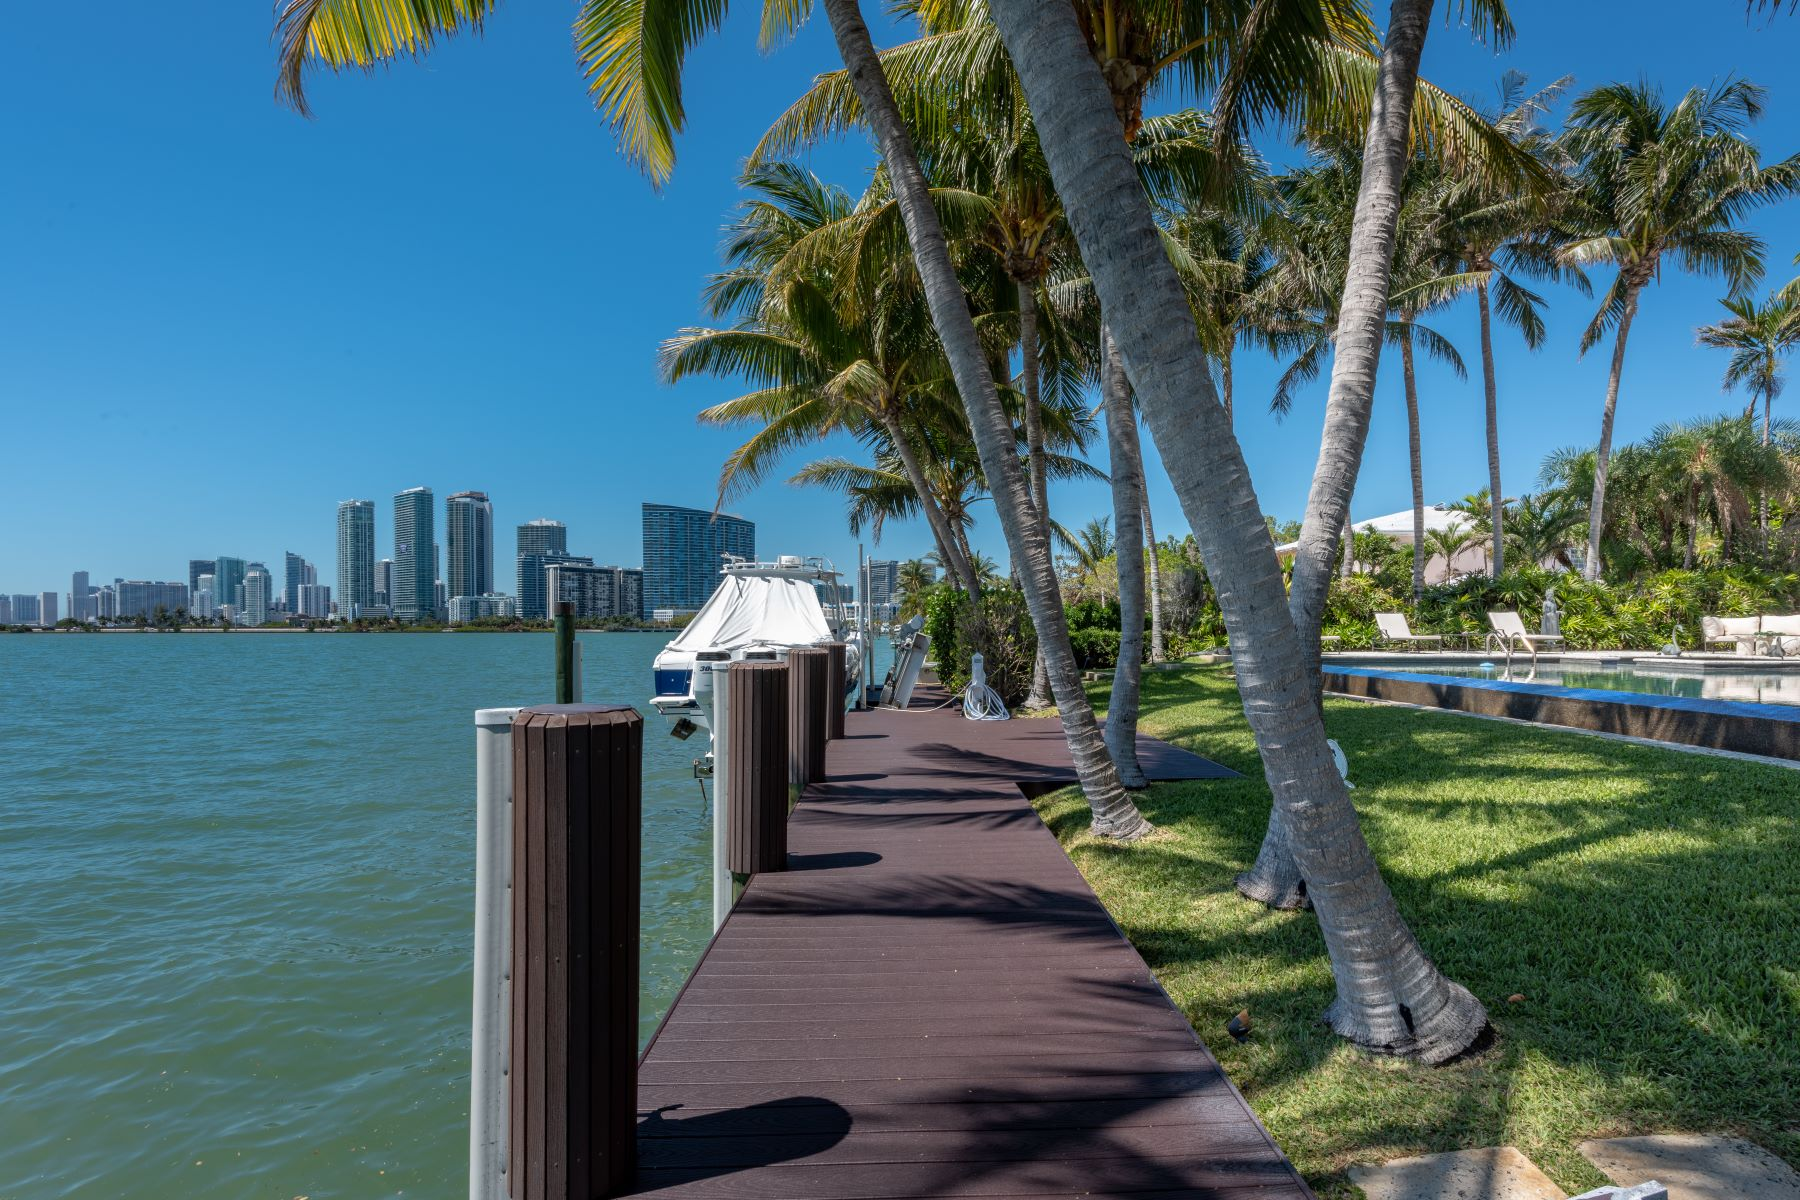 Villa per Vendita alle ore 4411 Sabal Palm Rd 4411 Sabal Palm Rd Miami, Florida 33137 Stati Uniti